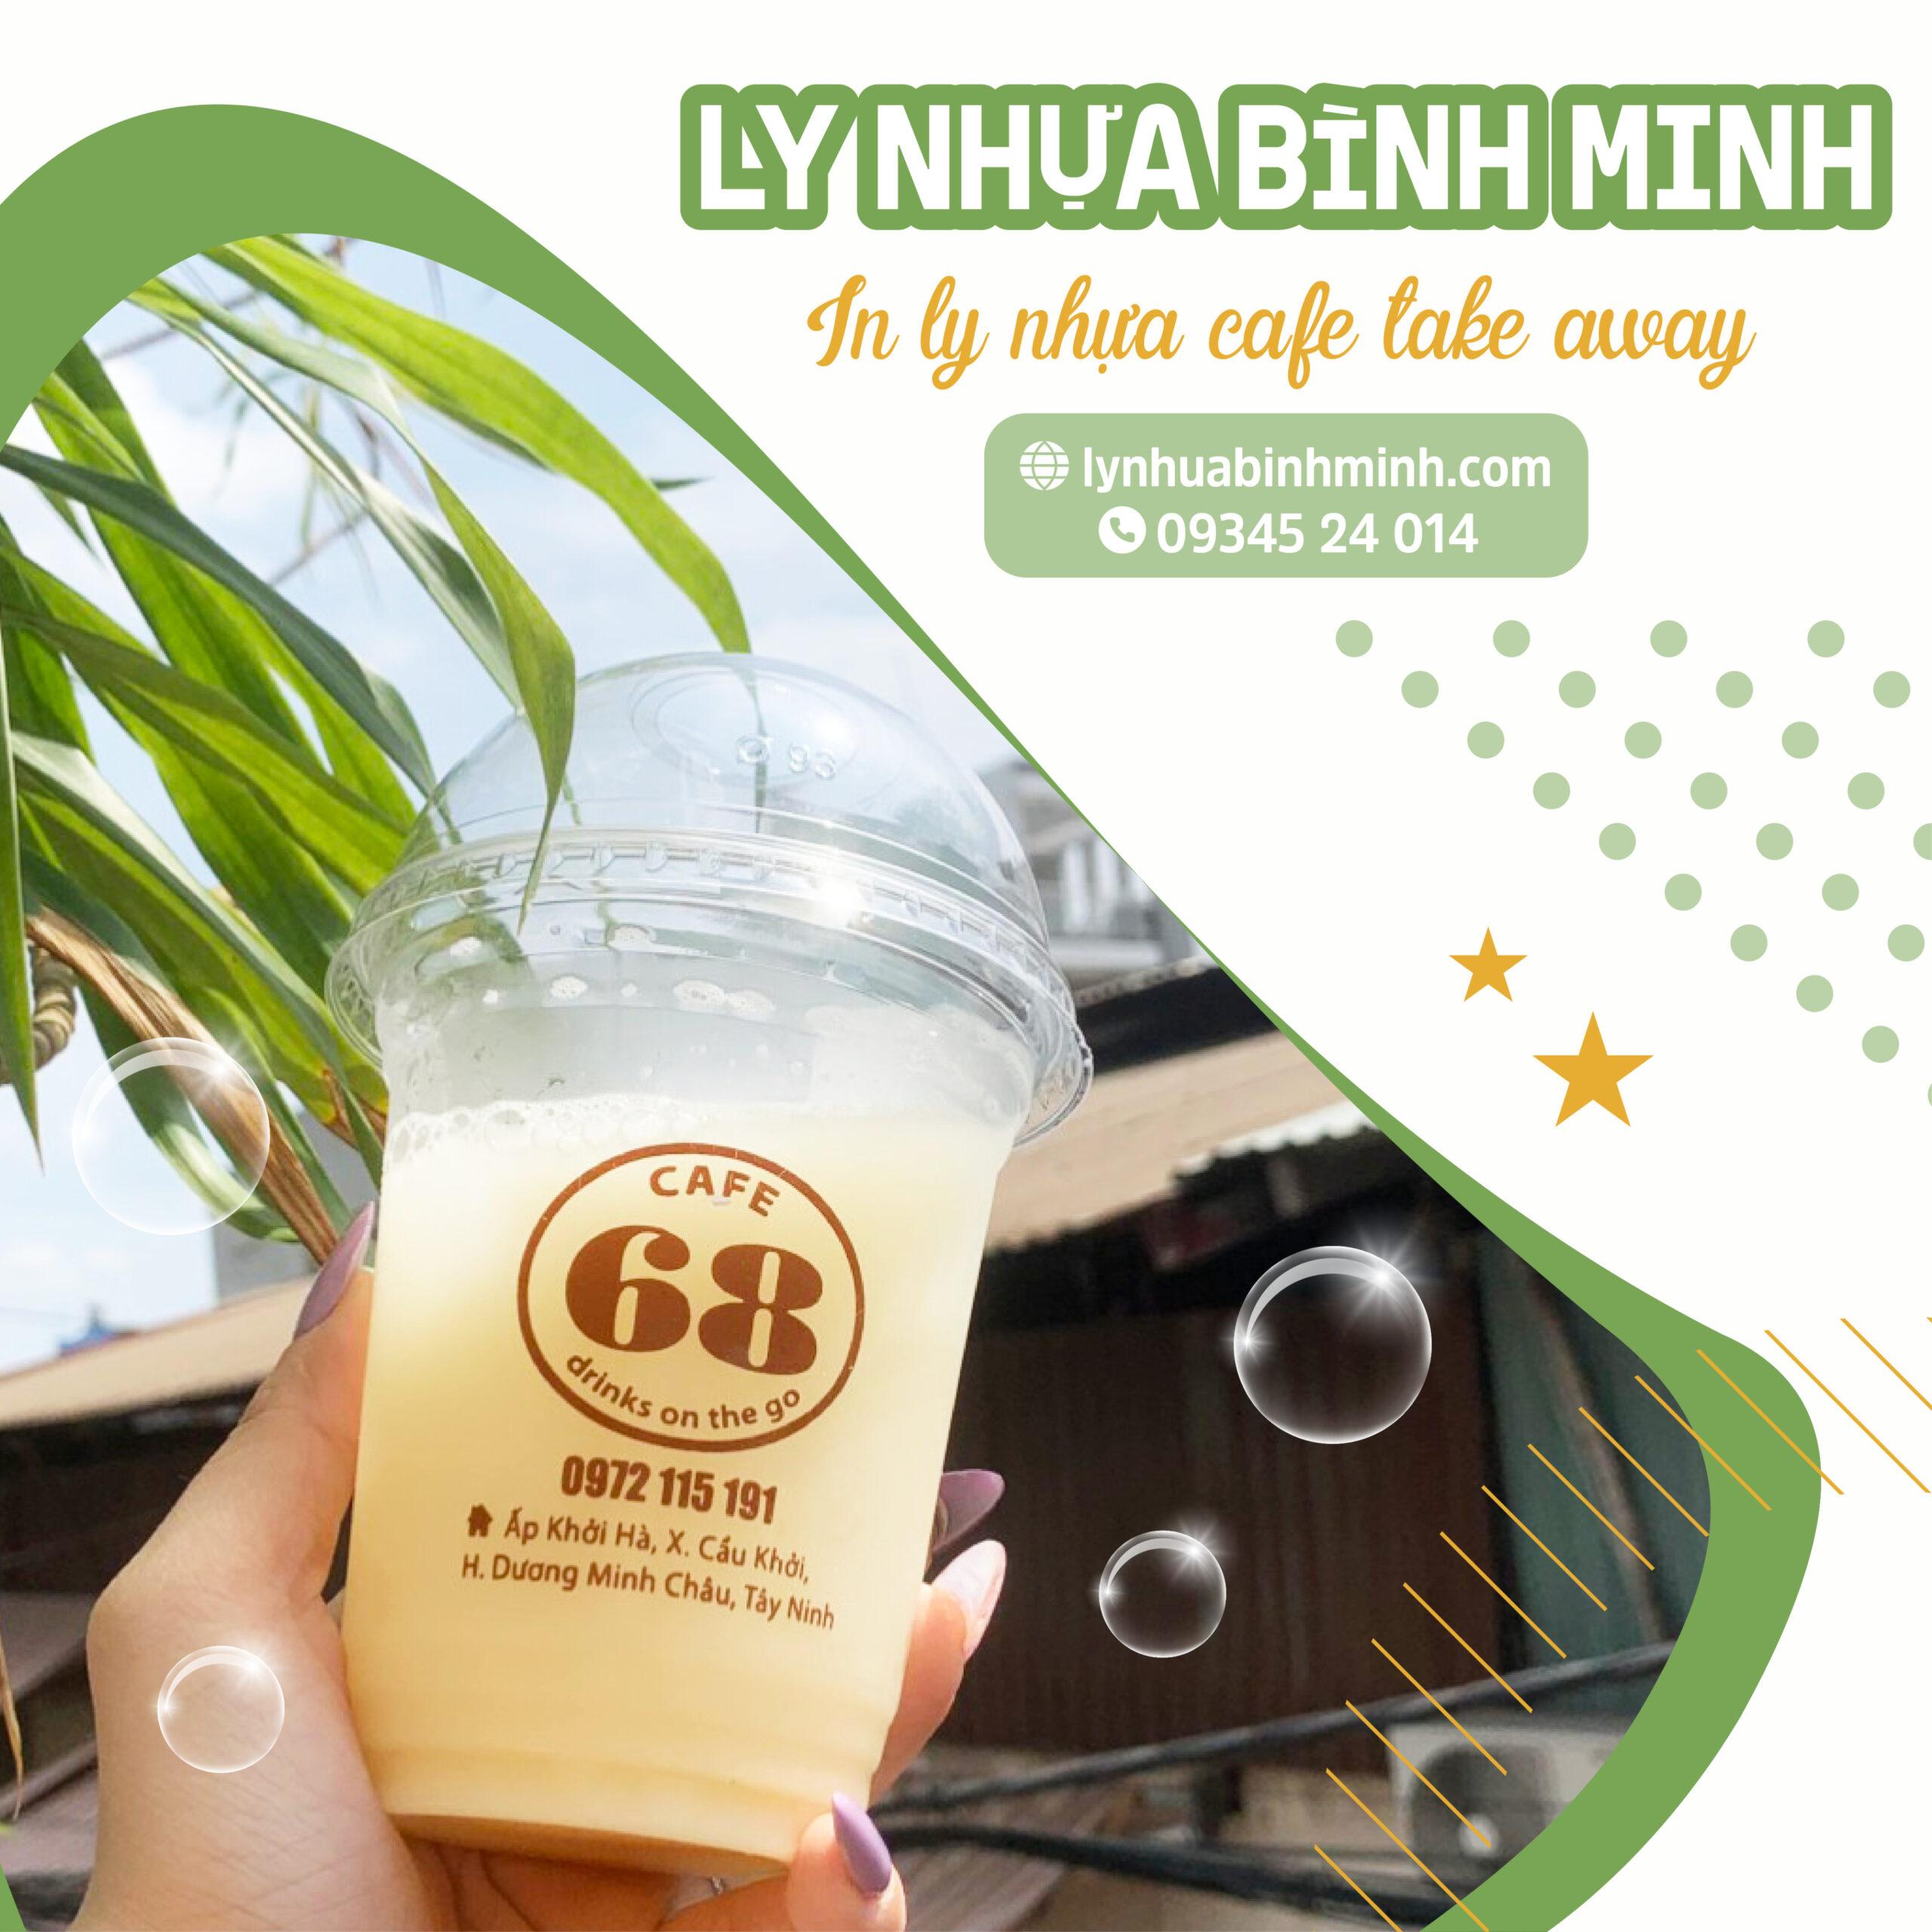 cafe-68